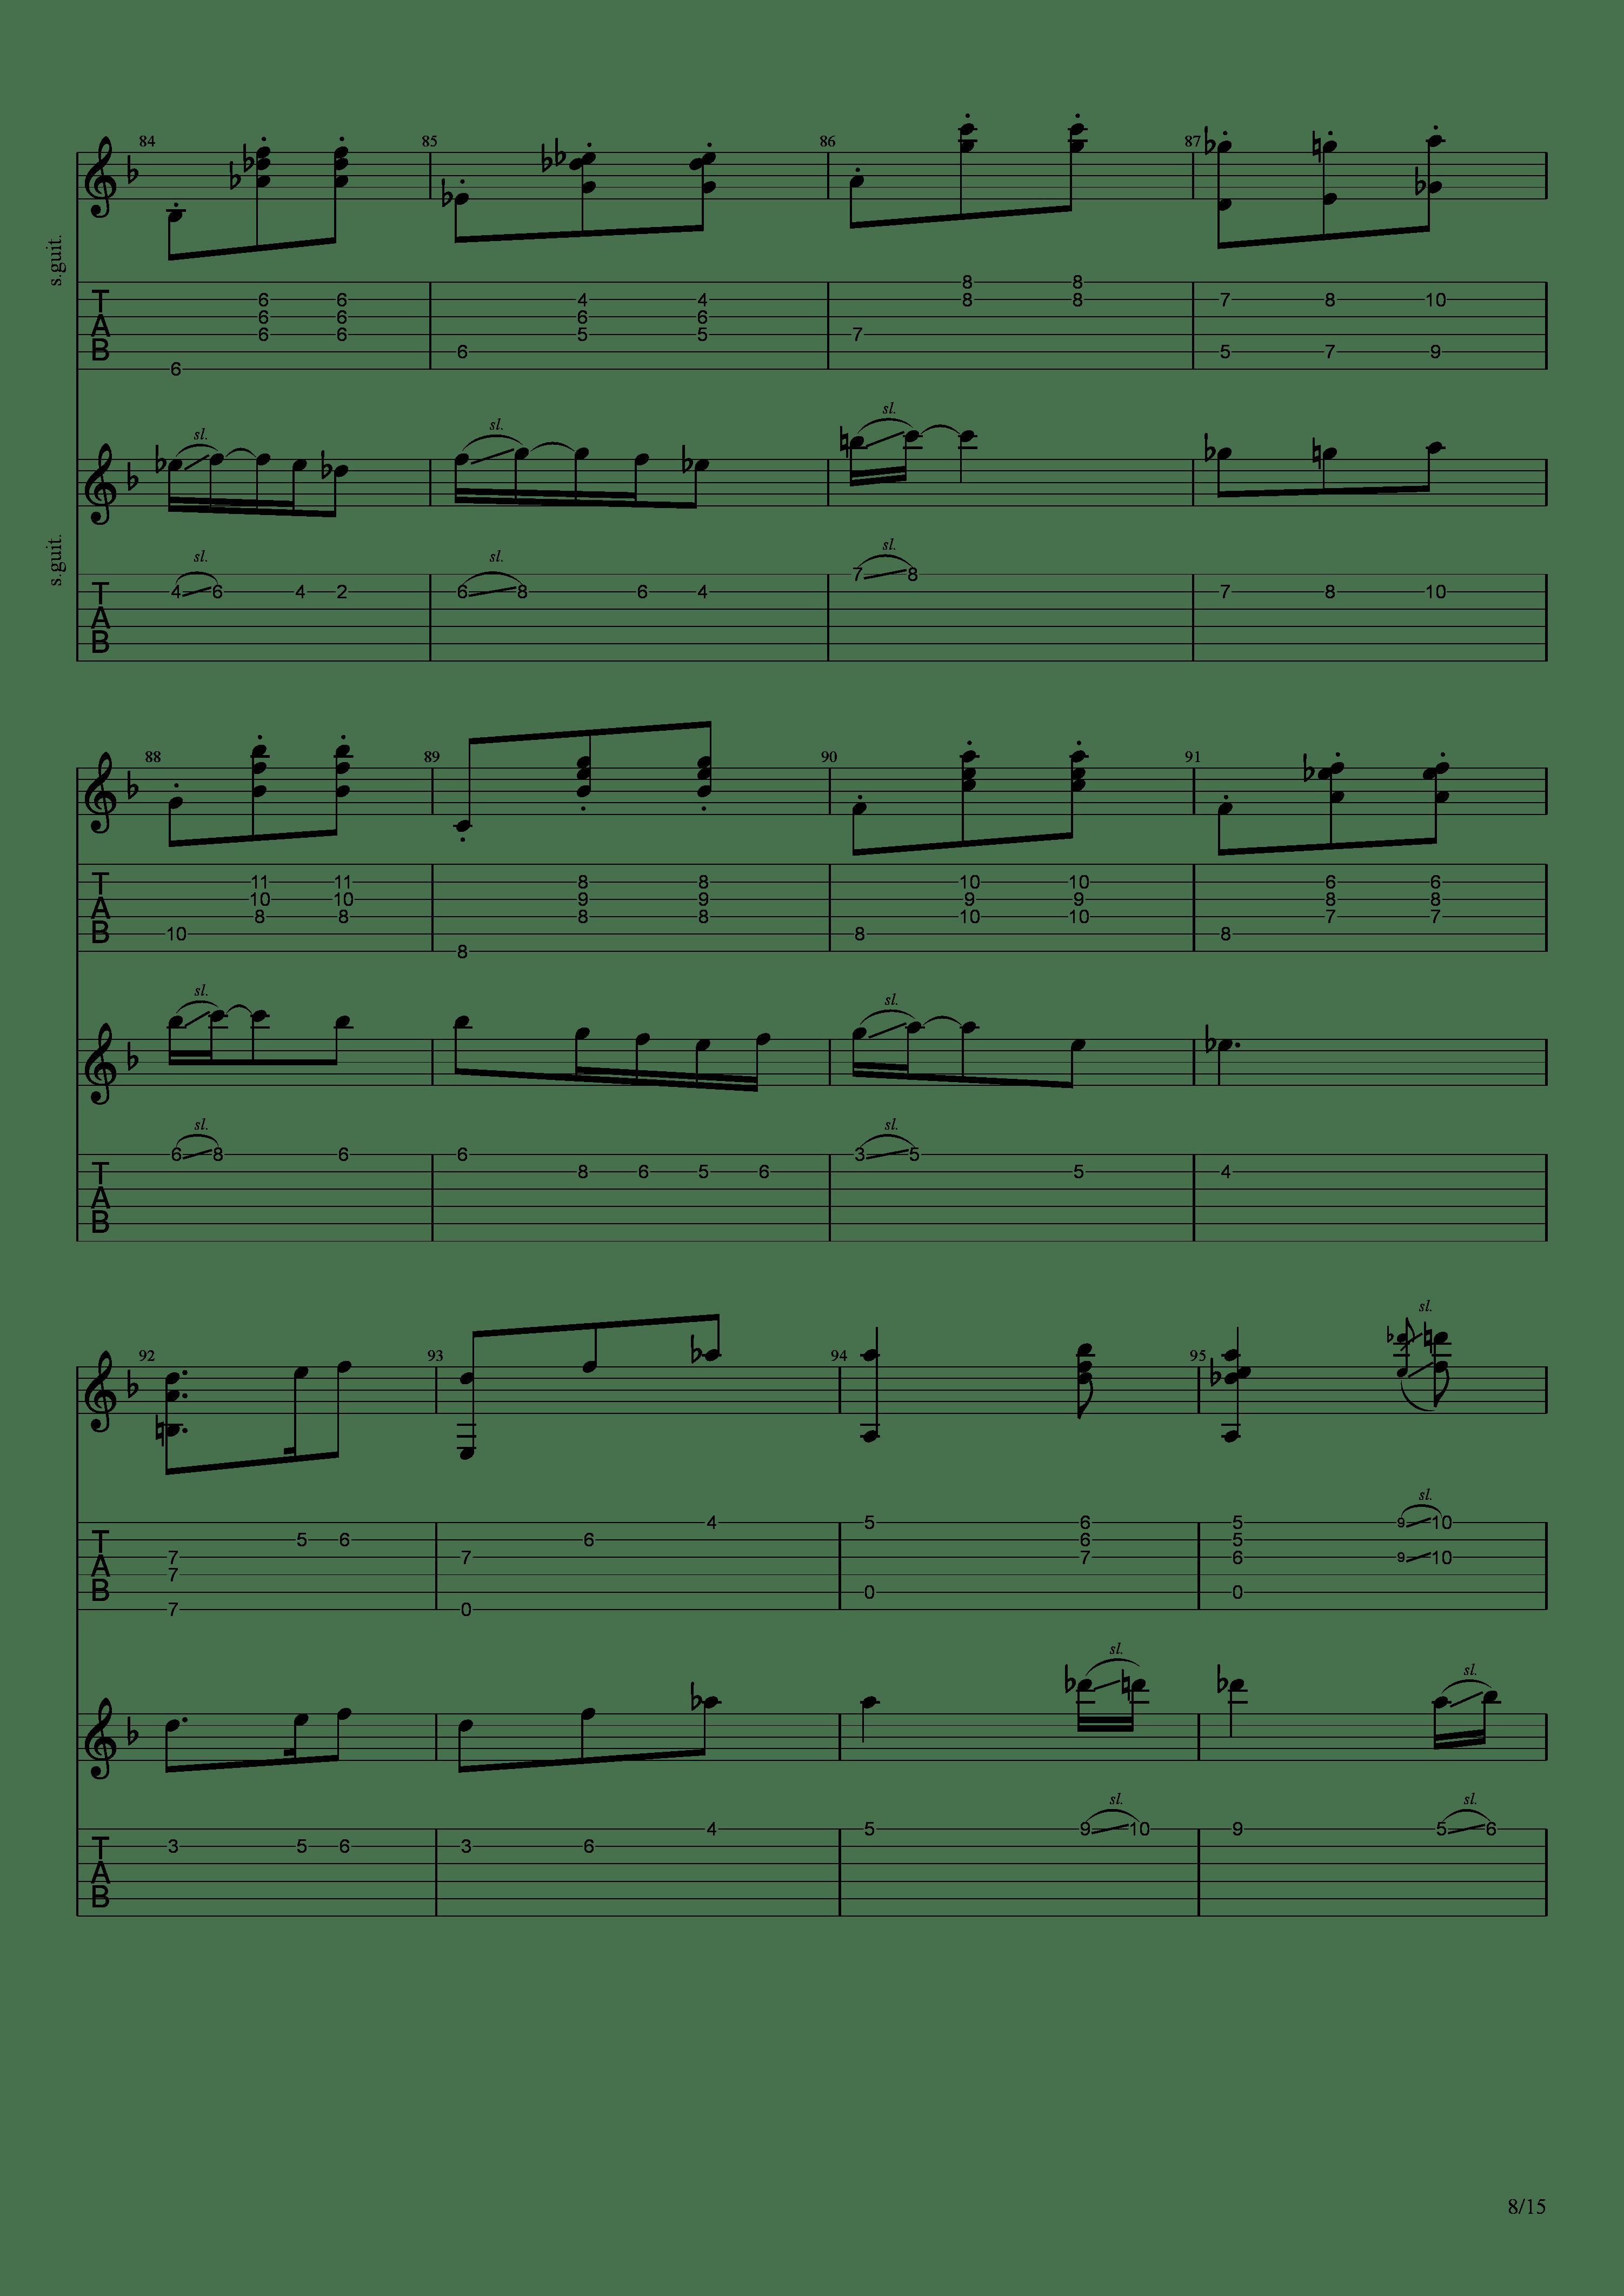 Labyrinth (松井佑贵&井草圣二)吉他谱8